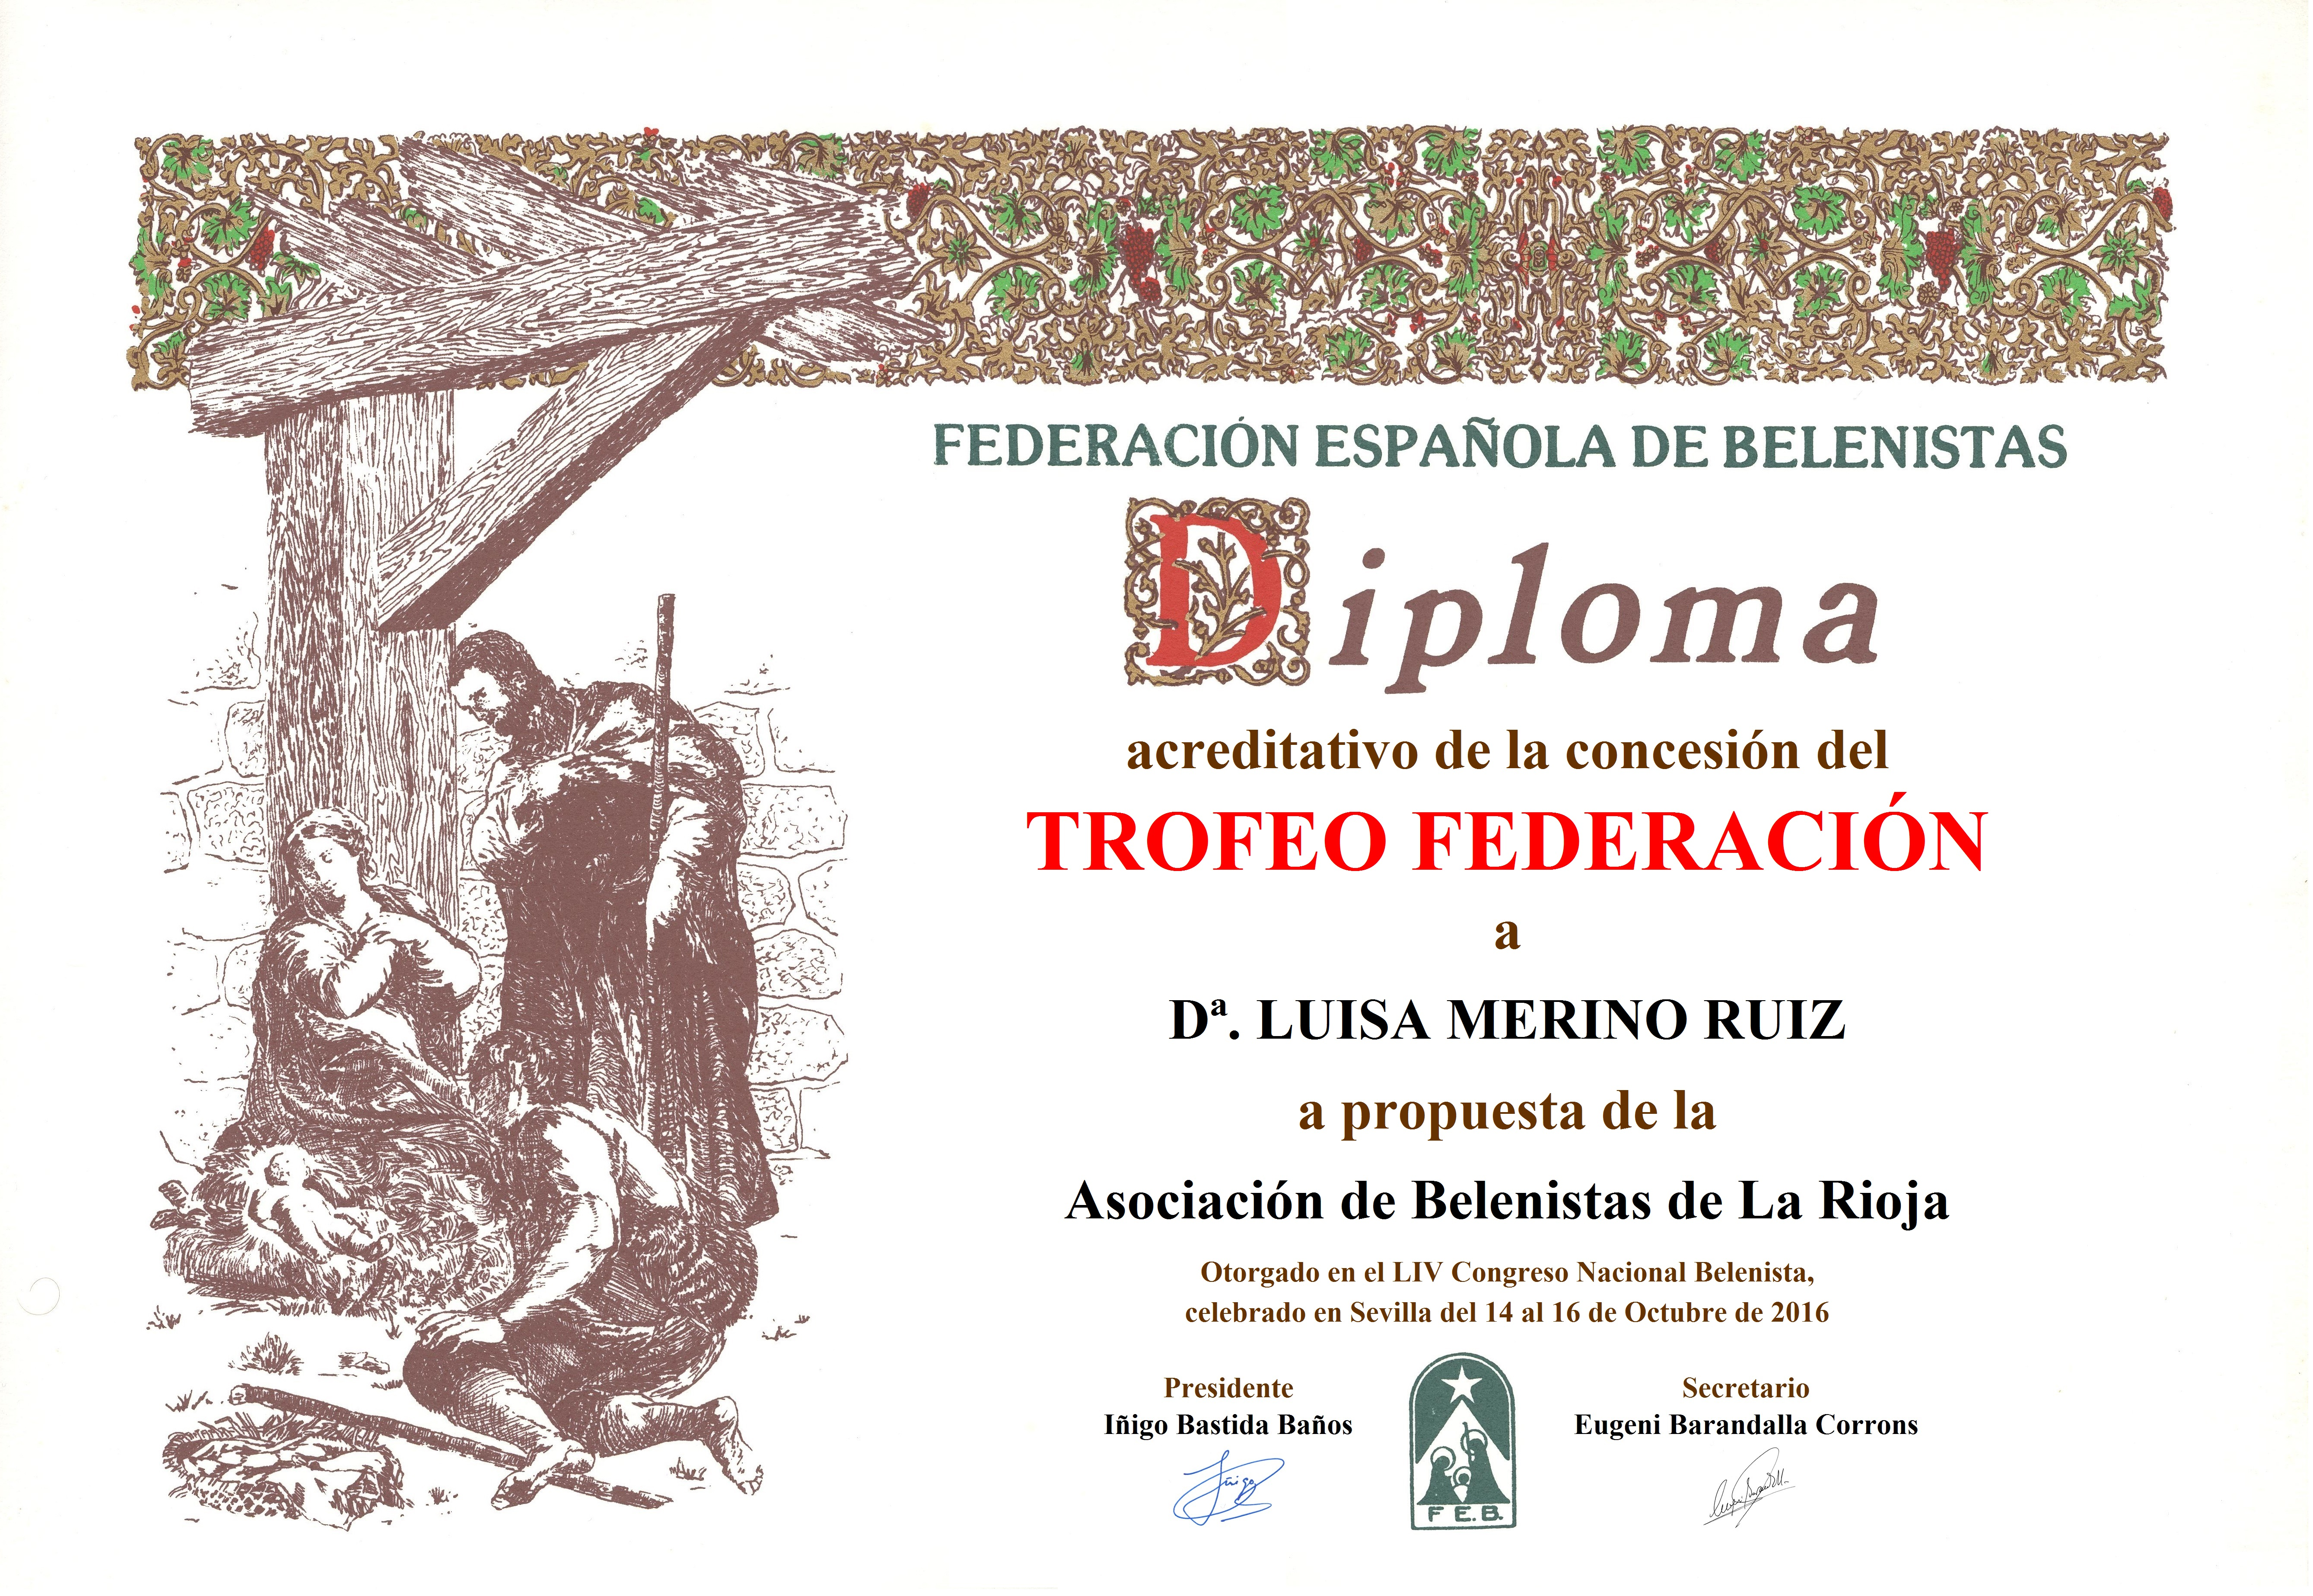 Luisa Merino Ruiz - Diploma Trofeo FEB 2016